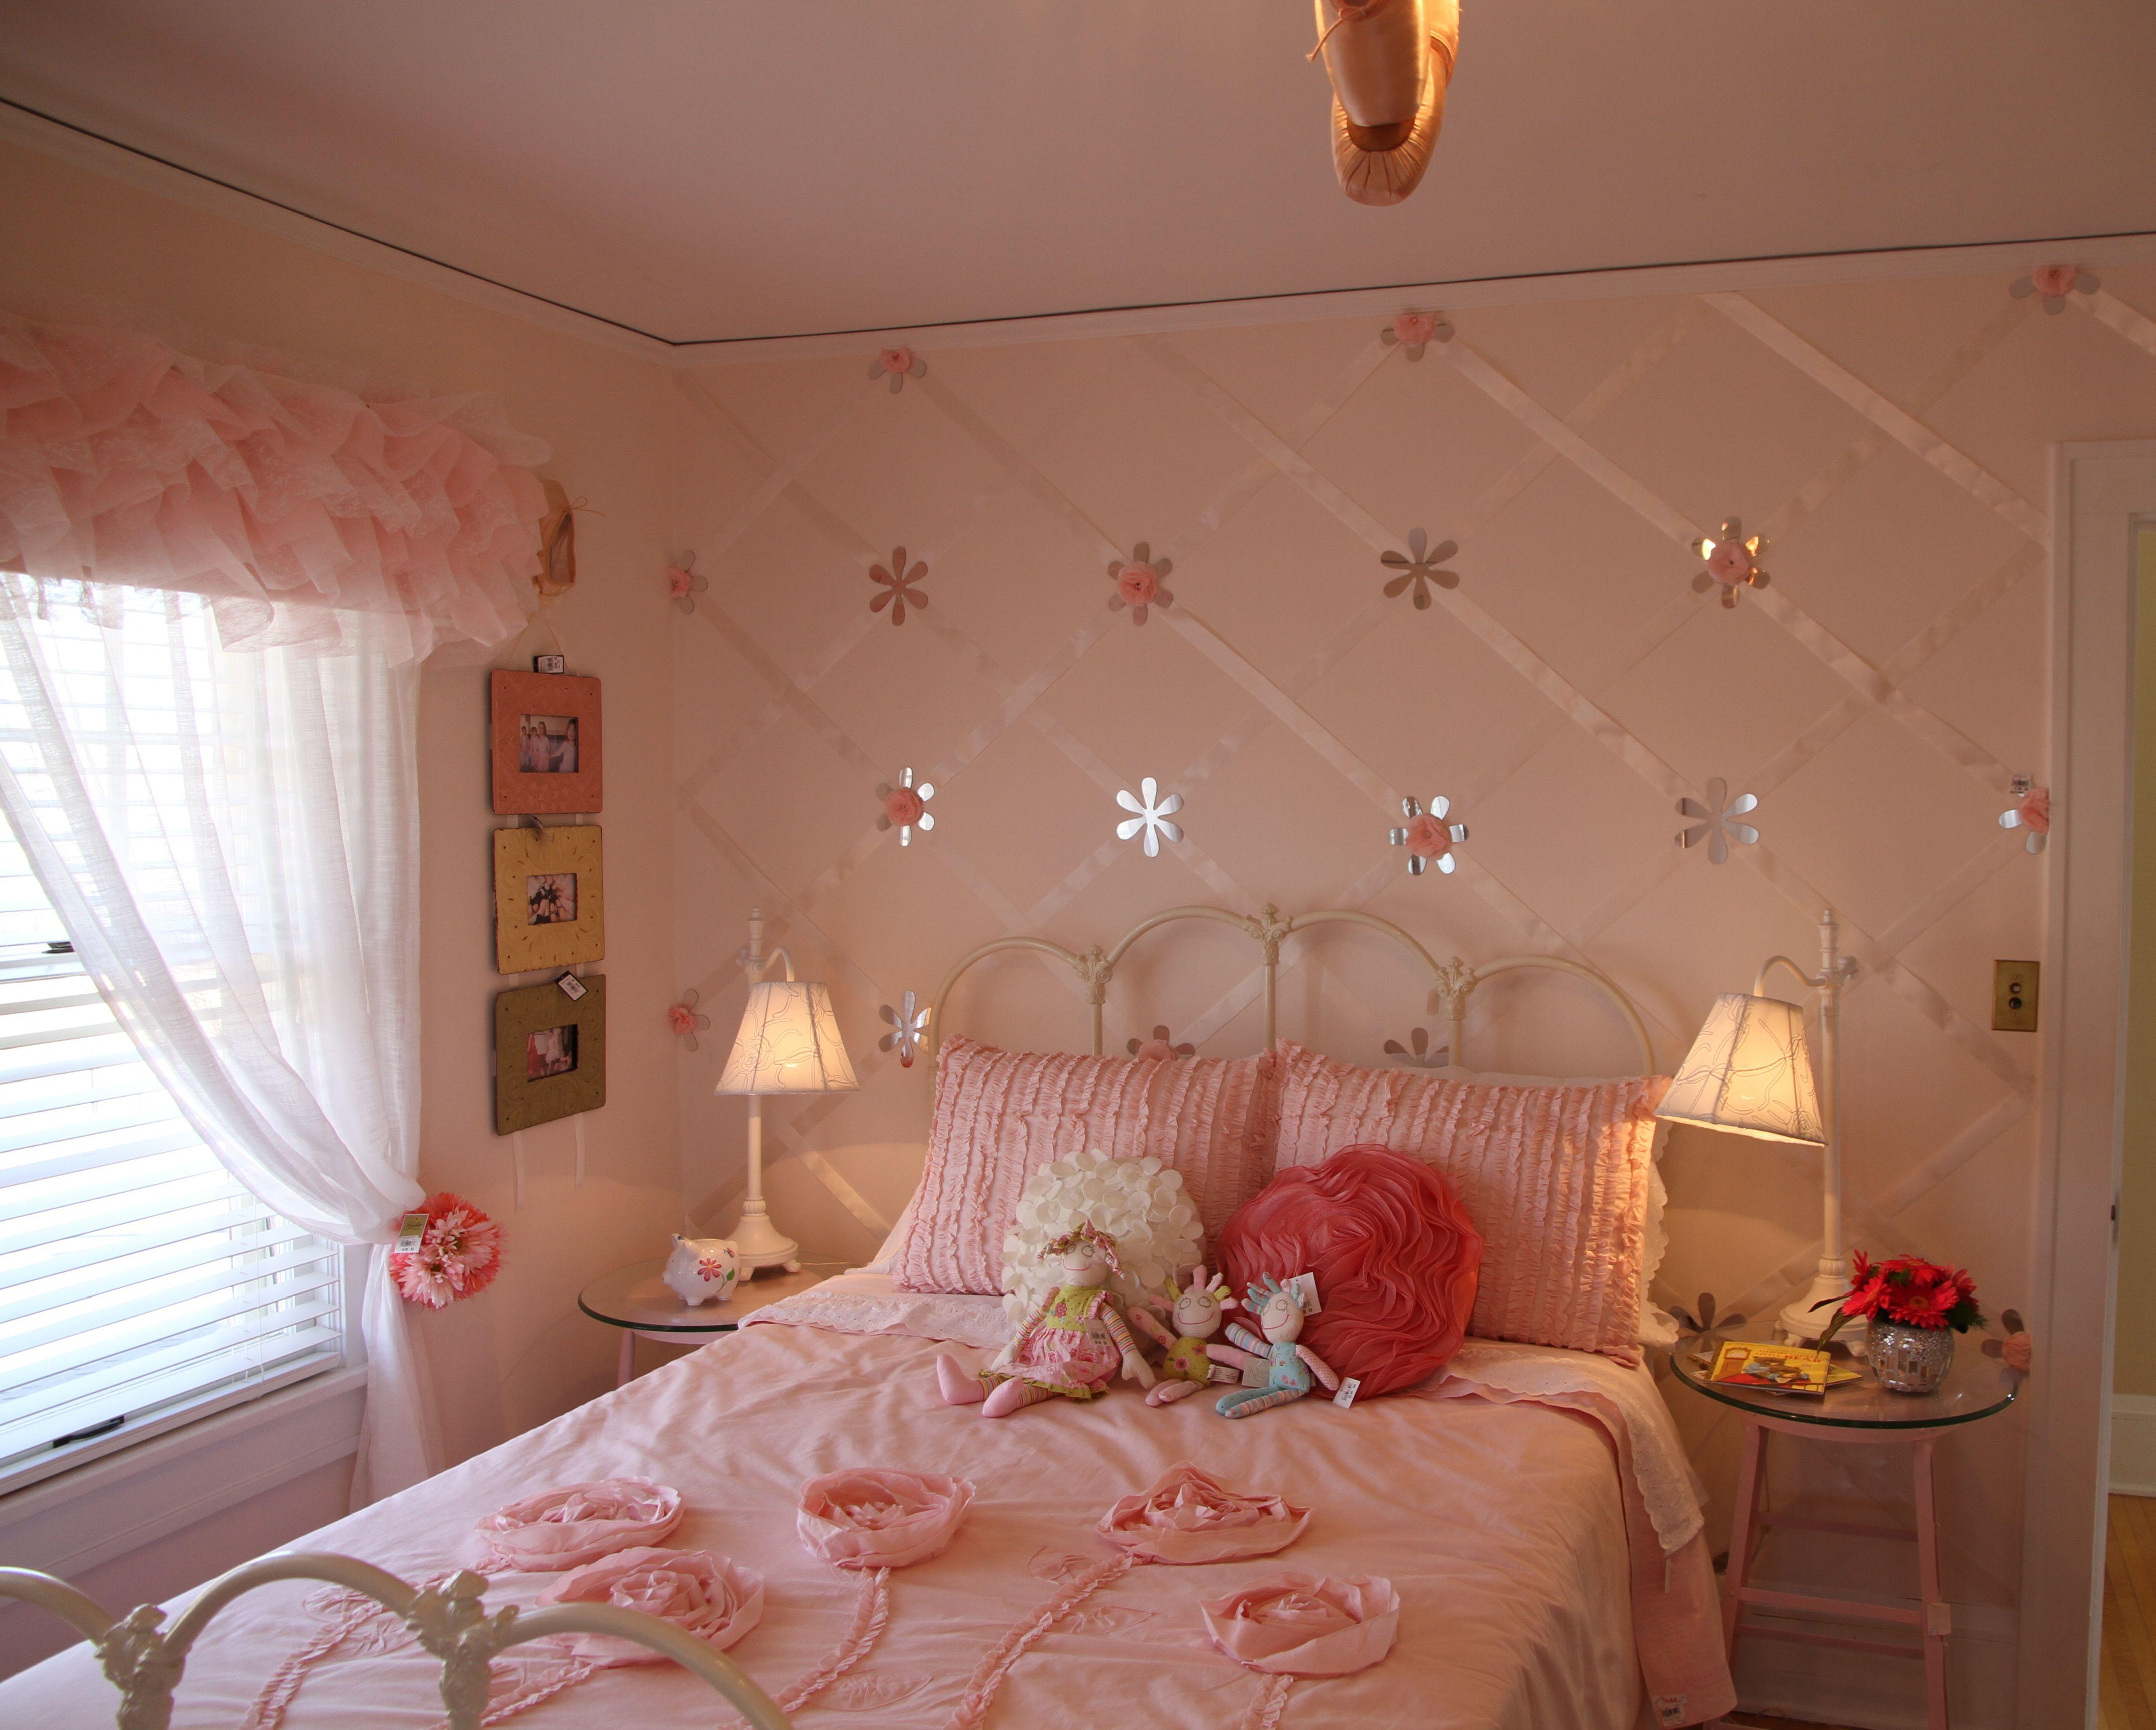 Accent wall paint ideas bedroom  Hirshfieldus Paint Albino   Bachmanus Spring House